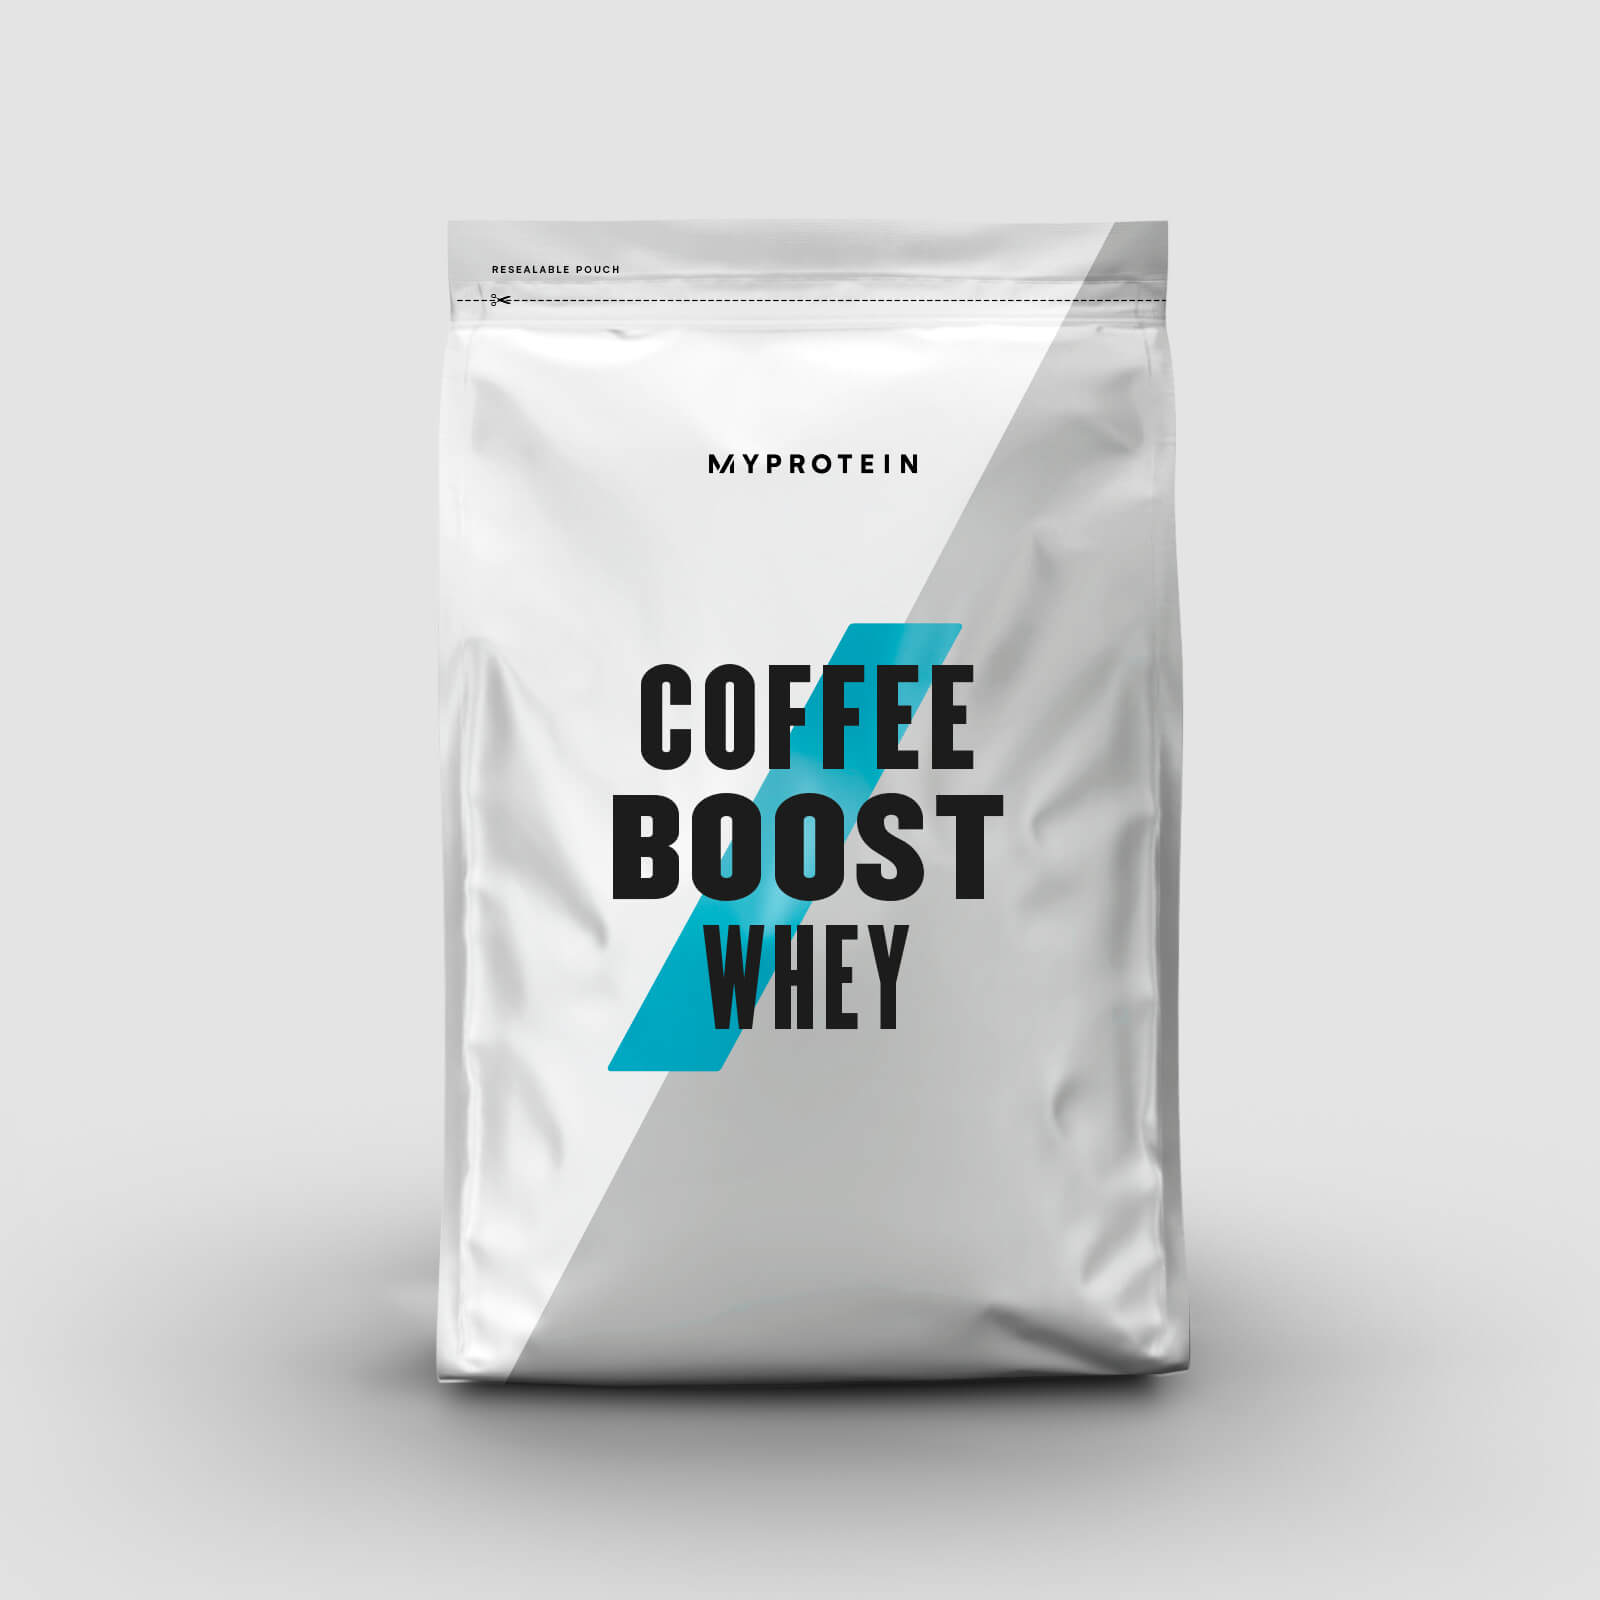 Coffee Boost Whey - 250g - Caramel Macchiato